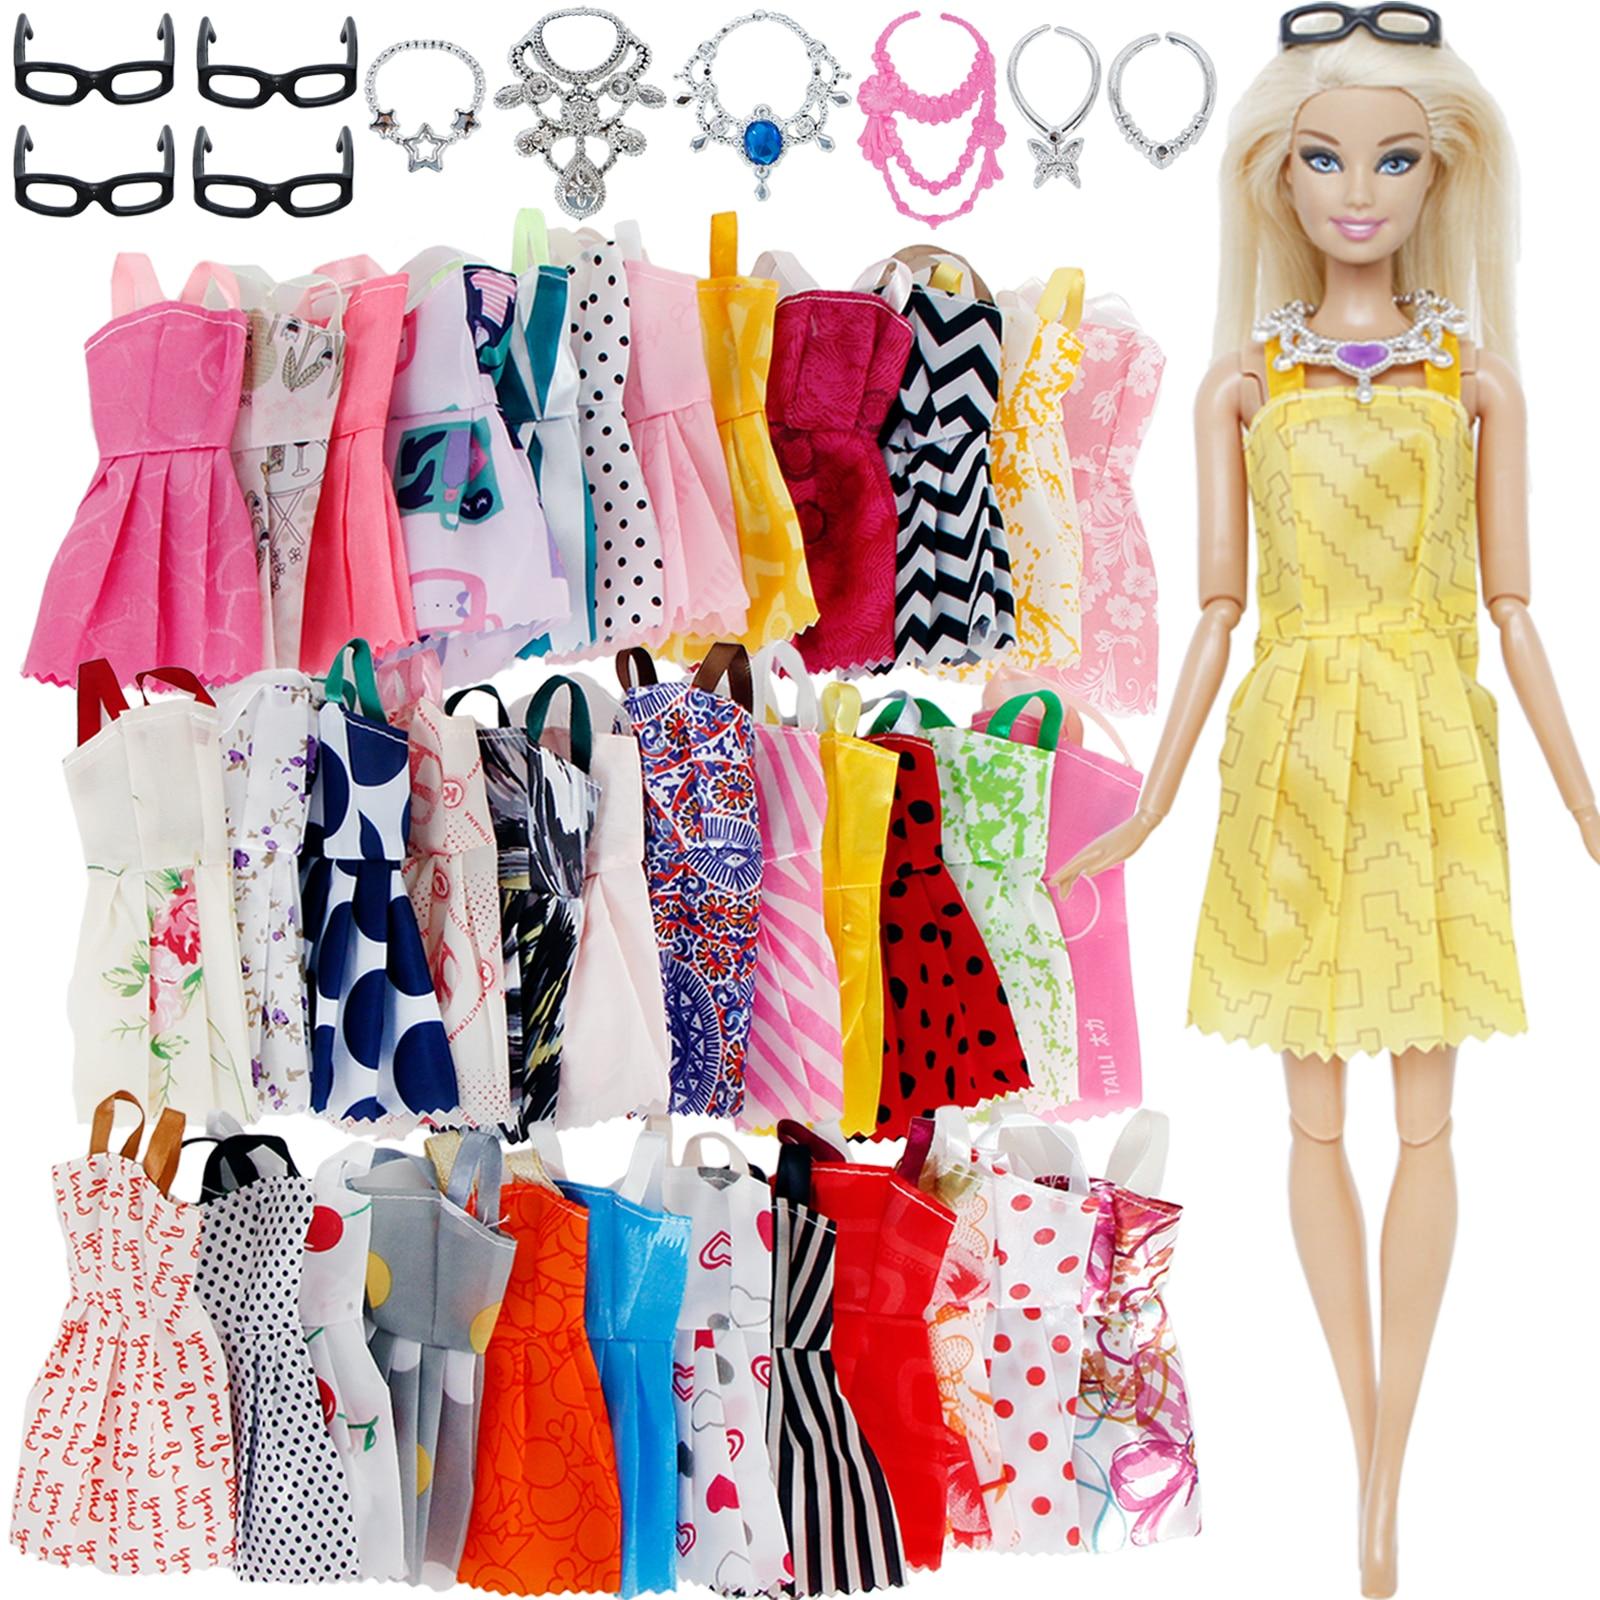 20 Pcs/Lot = Random 10x Mixed Style Mini Dress + 6x Plastic Necklaces + 4x Black Glasses Clothes For Barbie Doll Accessories